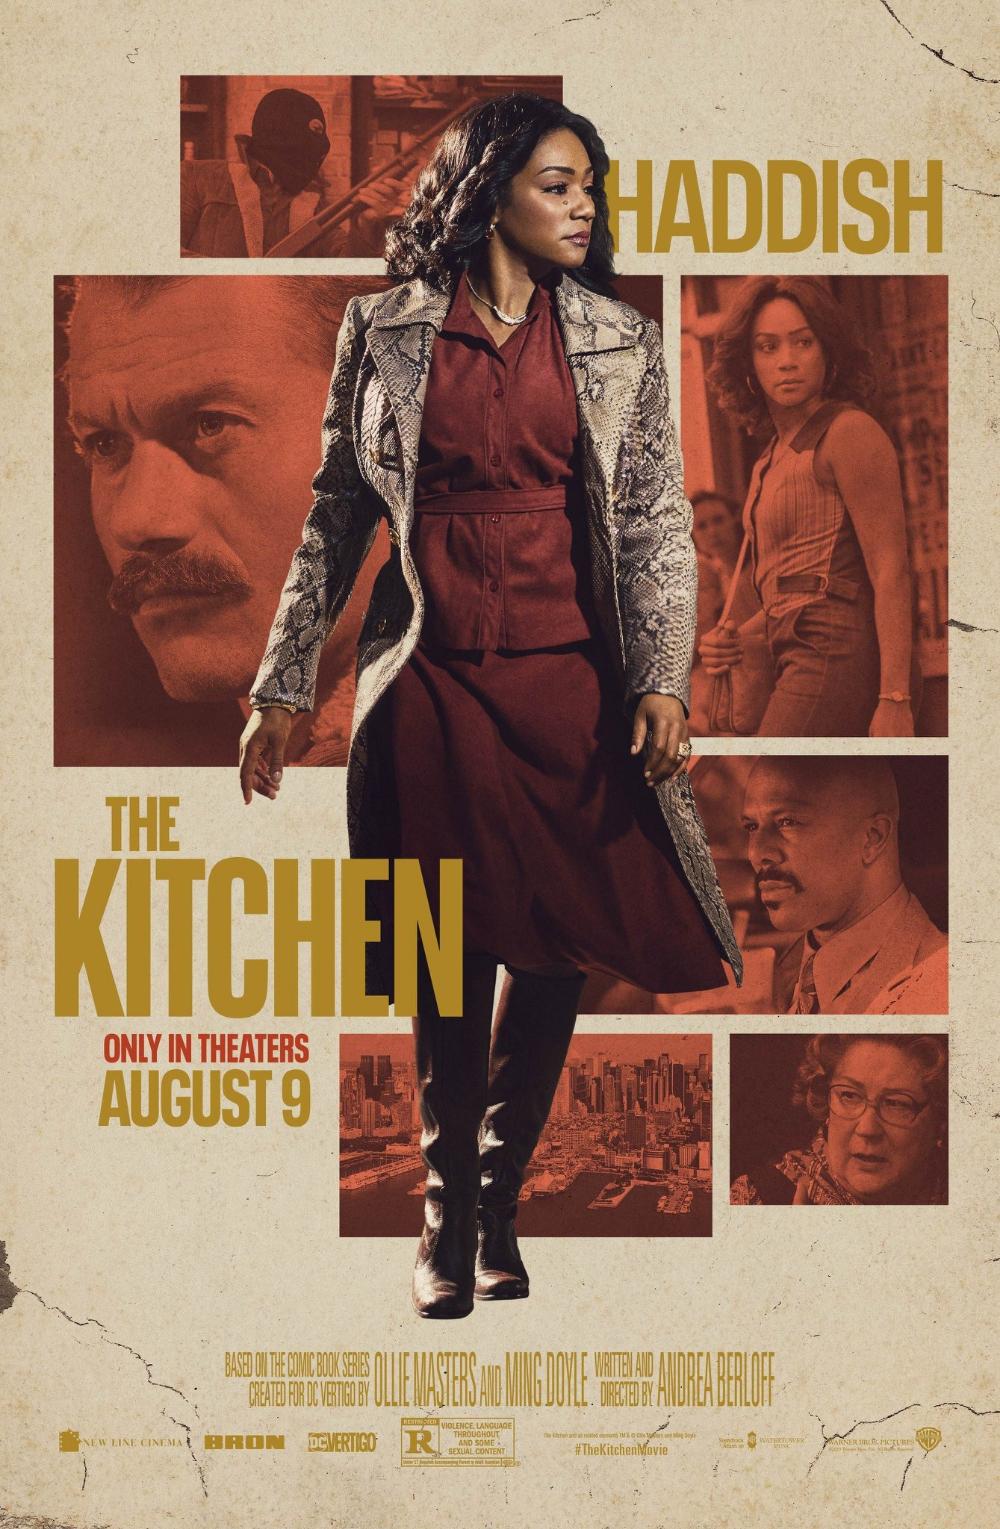 постер фильма адская кухня Full Movies Free Movies Online Full Movies Online Free